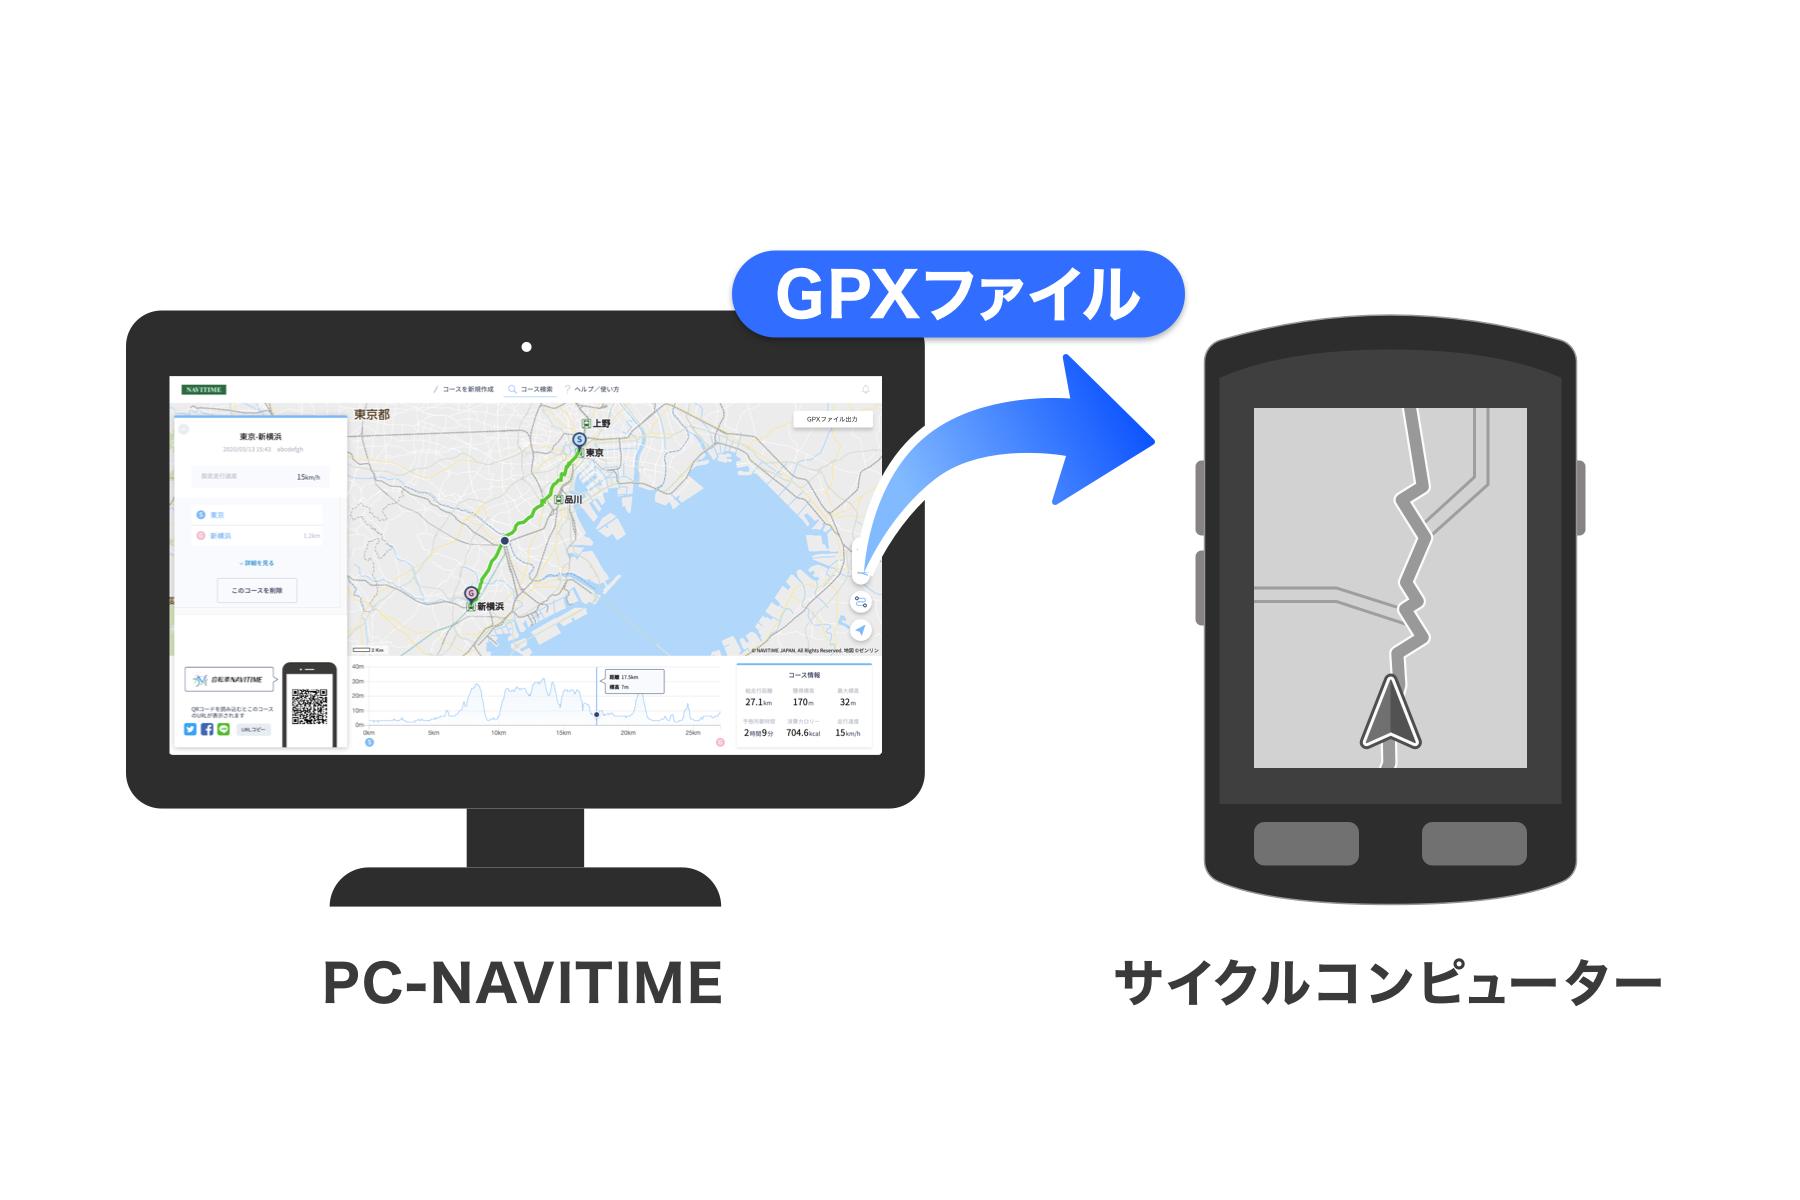 『PC-NAVITIME』のサイクリングコース作成機能 GPXファイルのエクスポート機能とログイン機能を追加